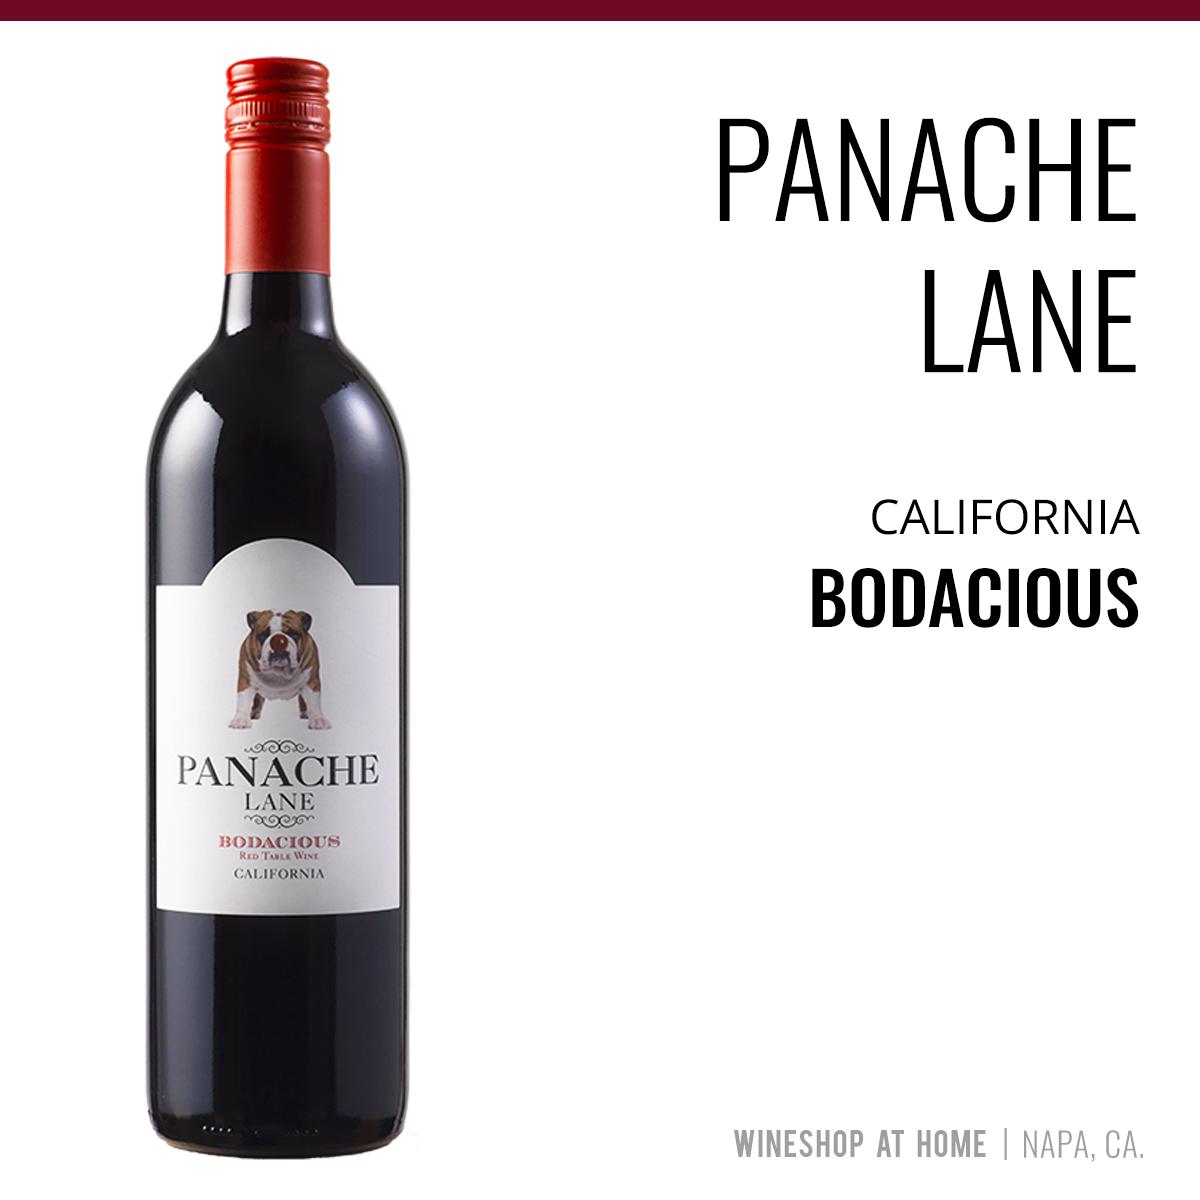 Panache Lane California Bodacious Wineshop At Home Wines Ripe Fruit Red Blend Wine